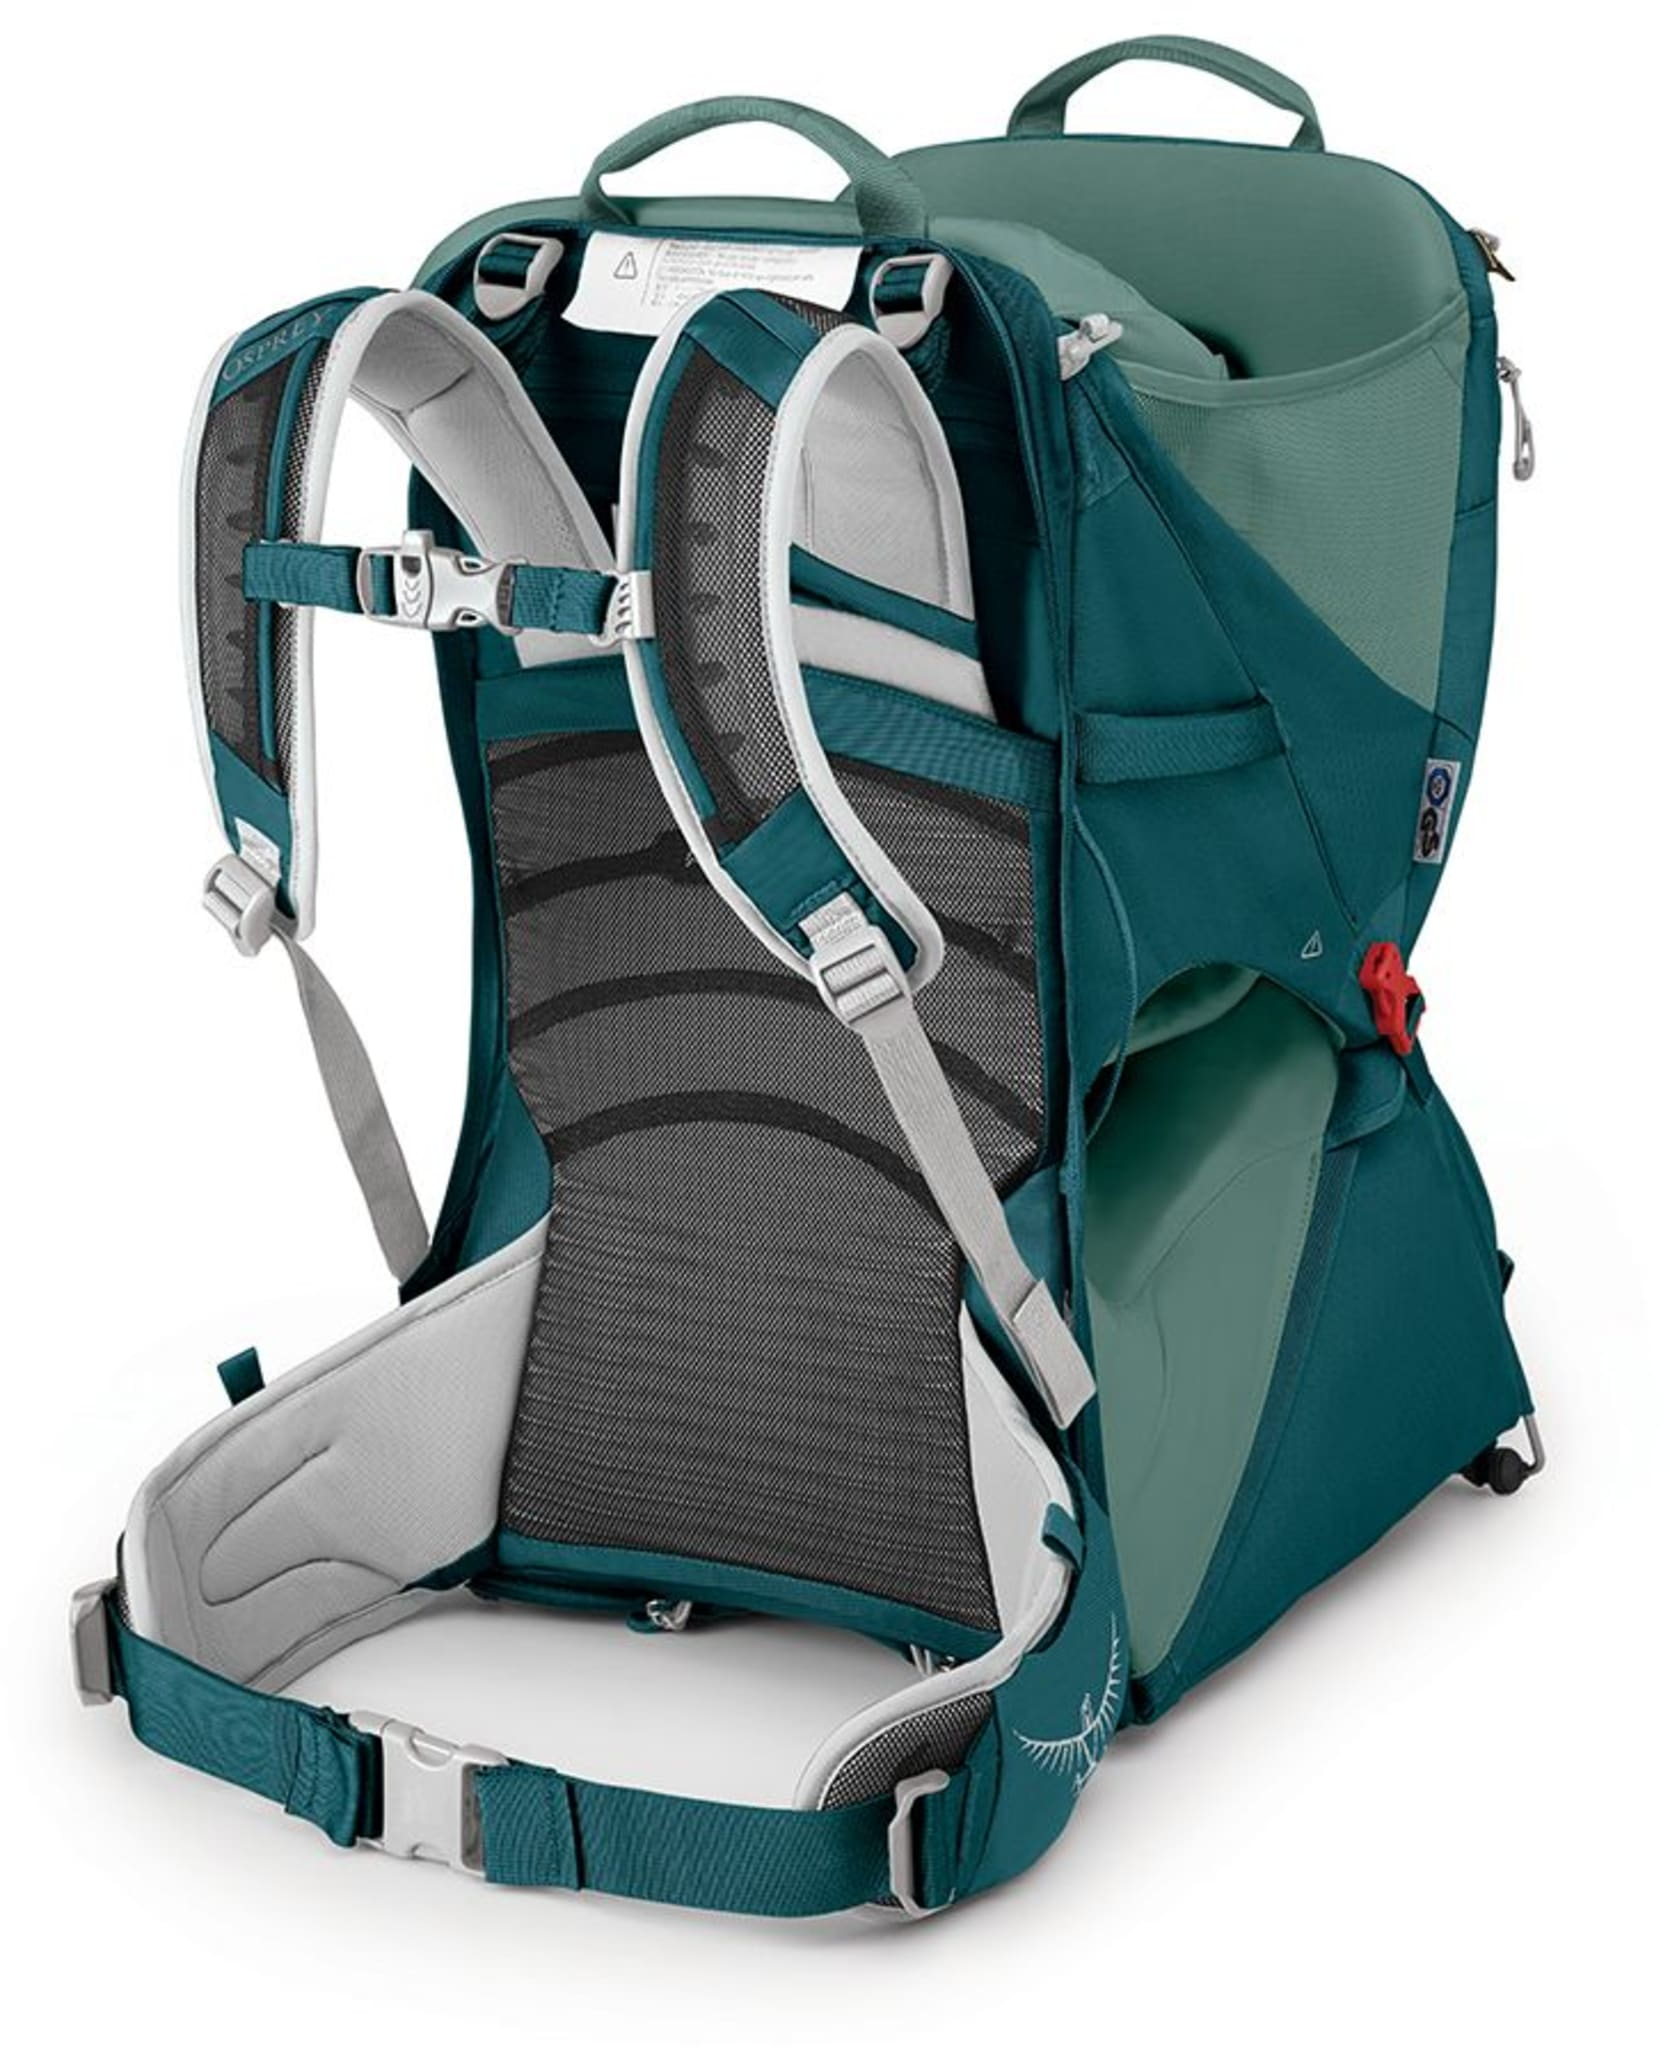 Komfortabel bæremeis fra Osprey